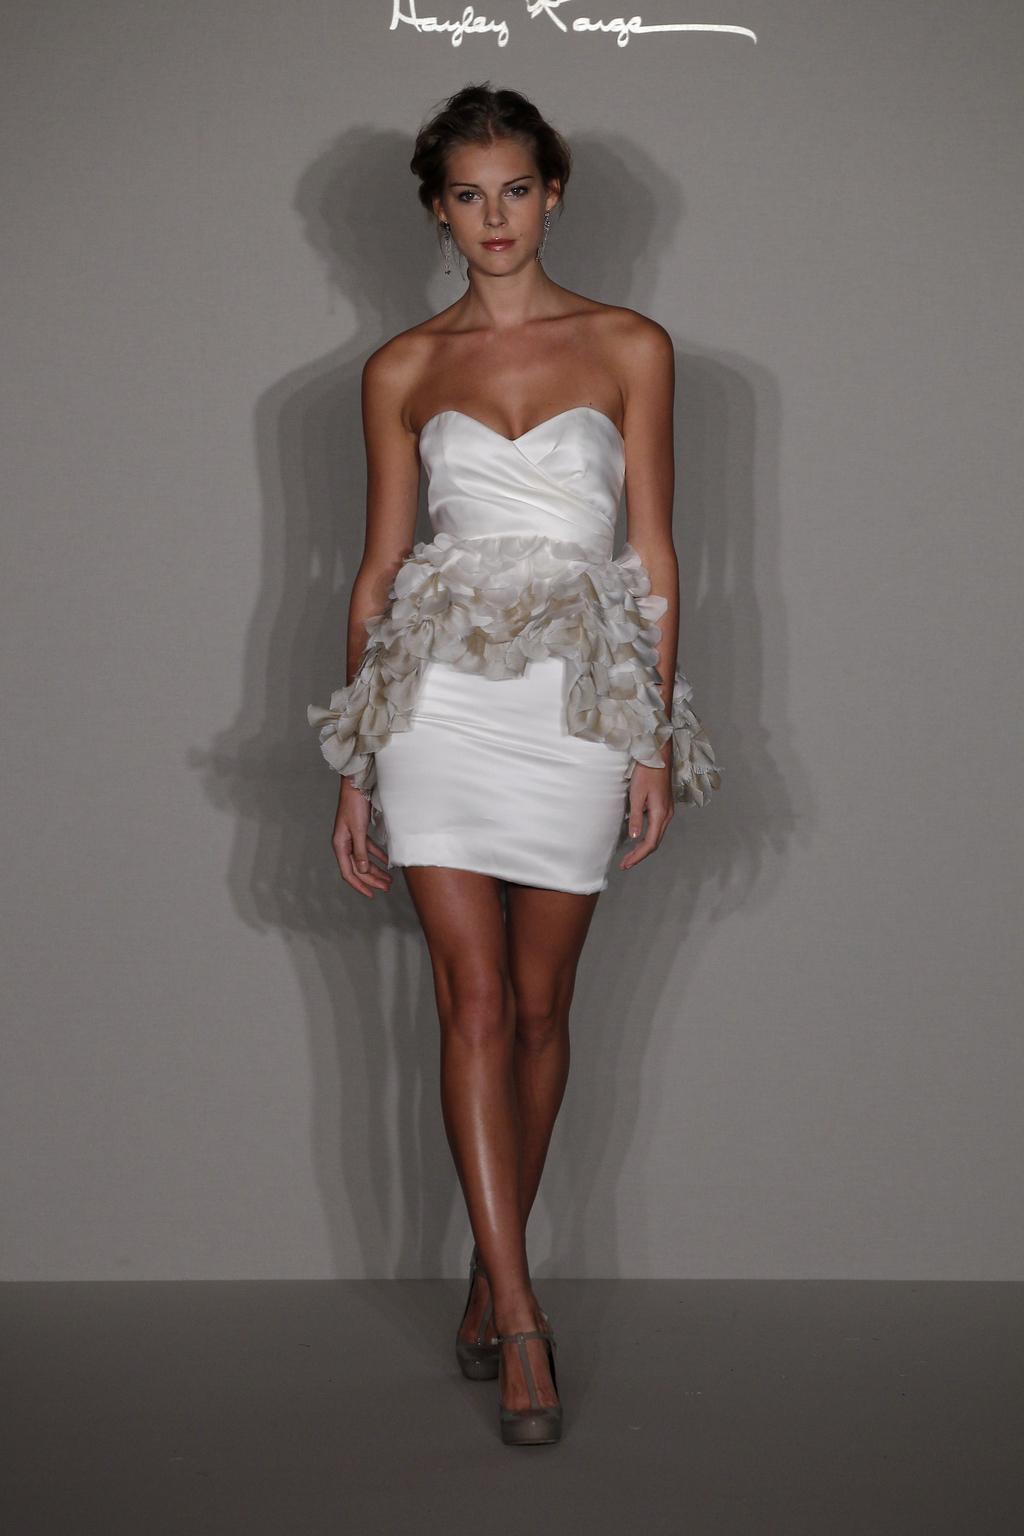 Hayley-page-wedding-dress-spring-2012-bridal-gowns-6209-lwd.full